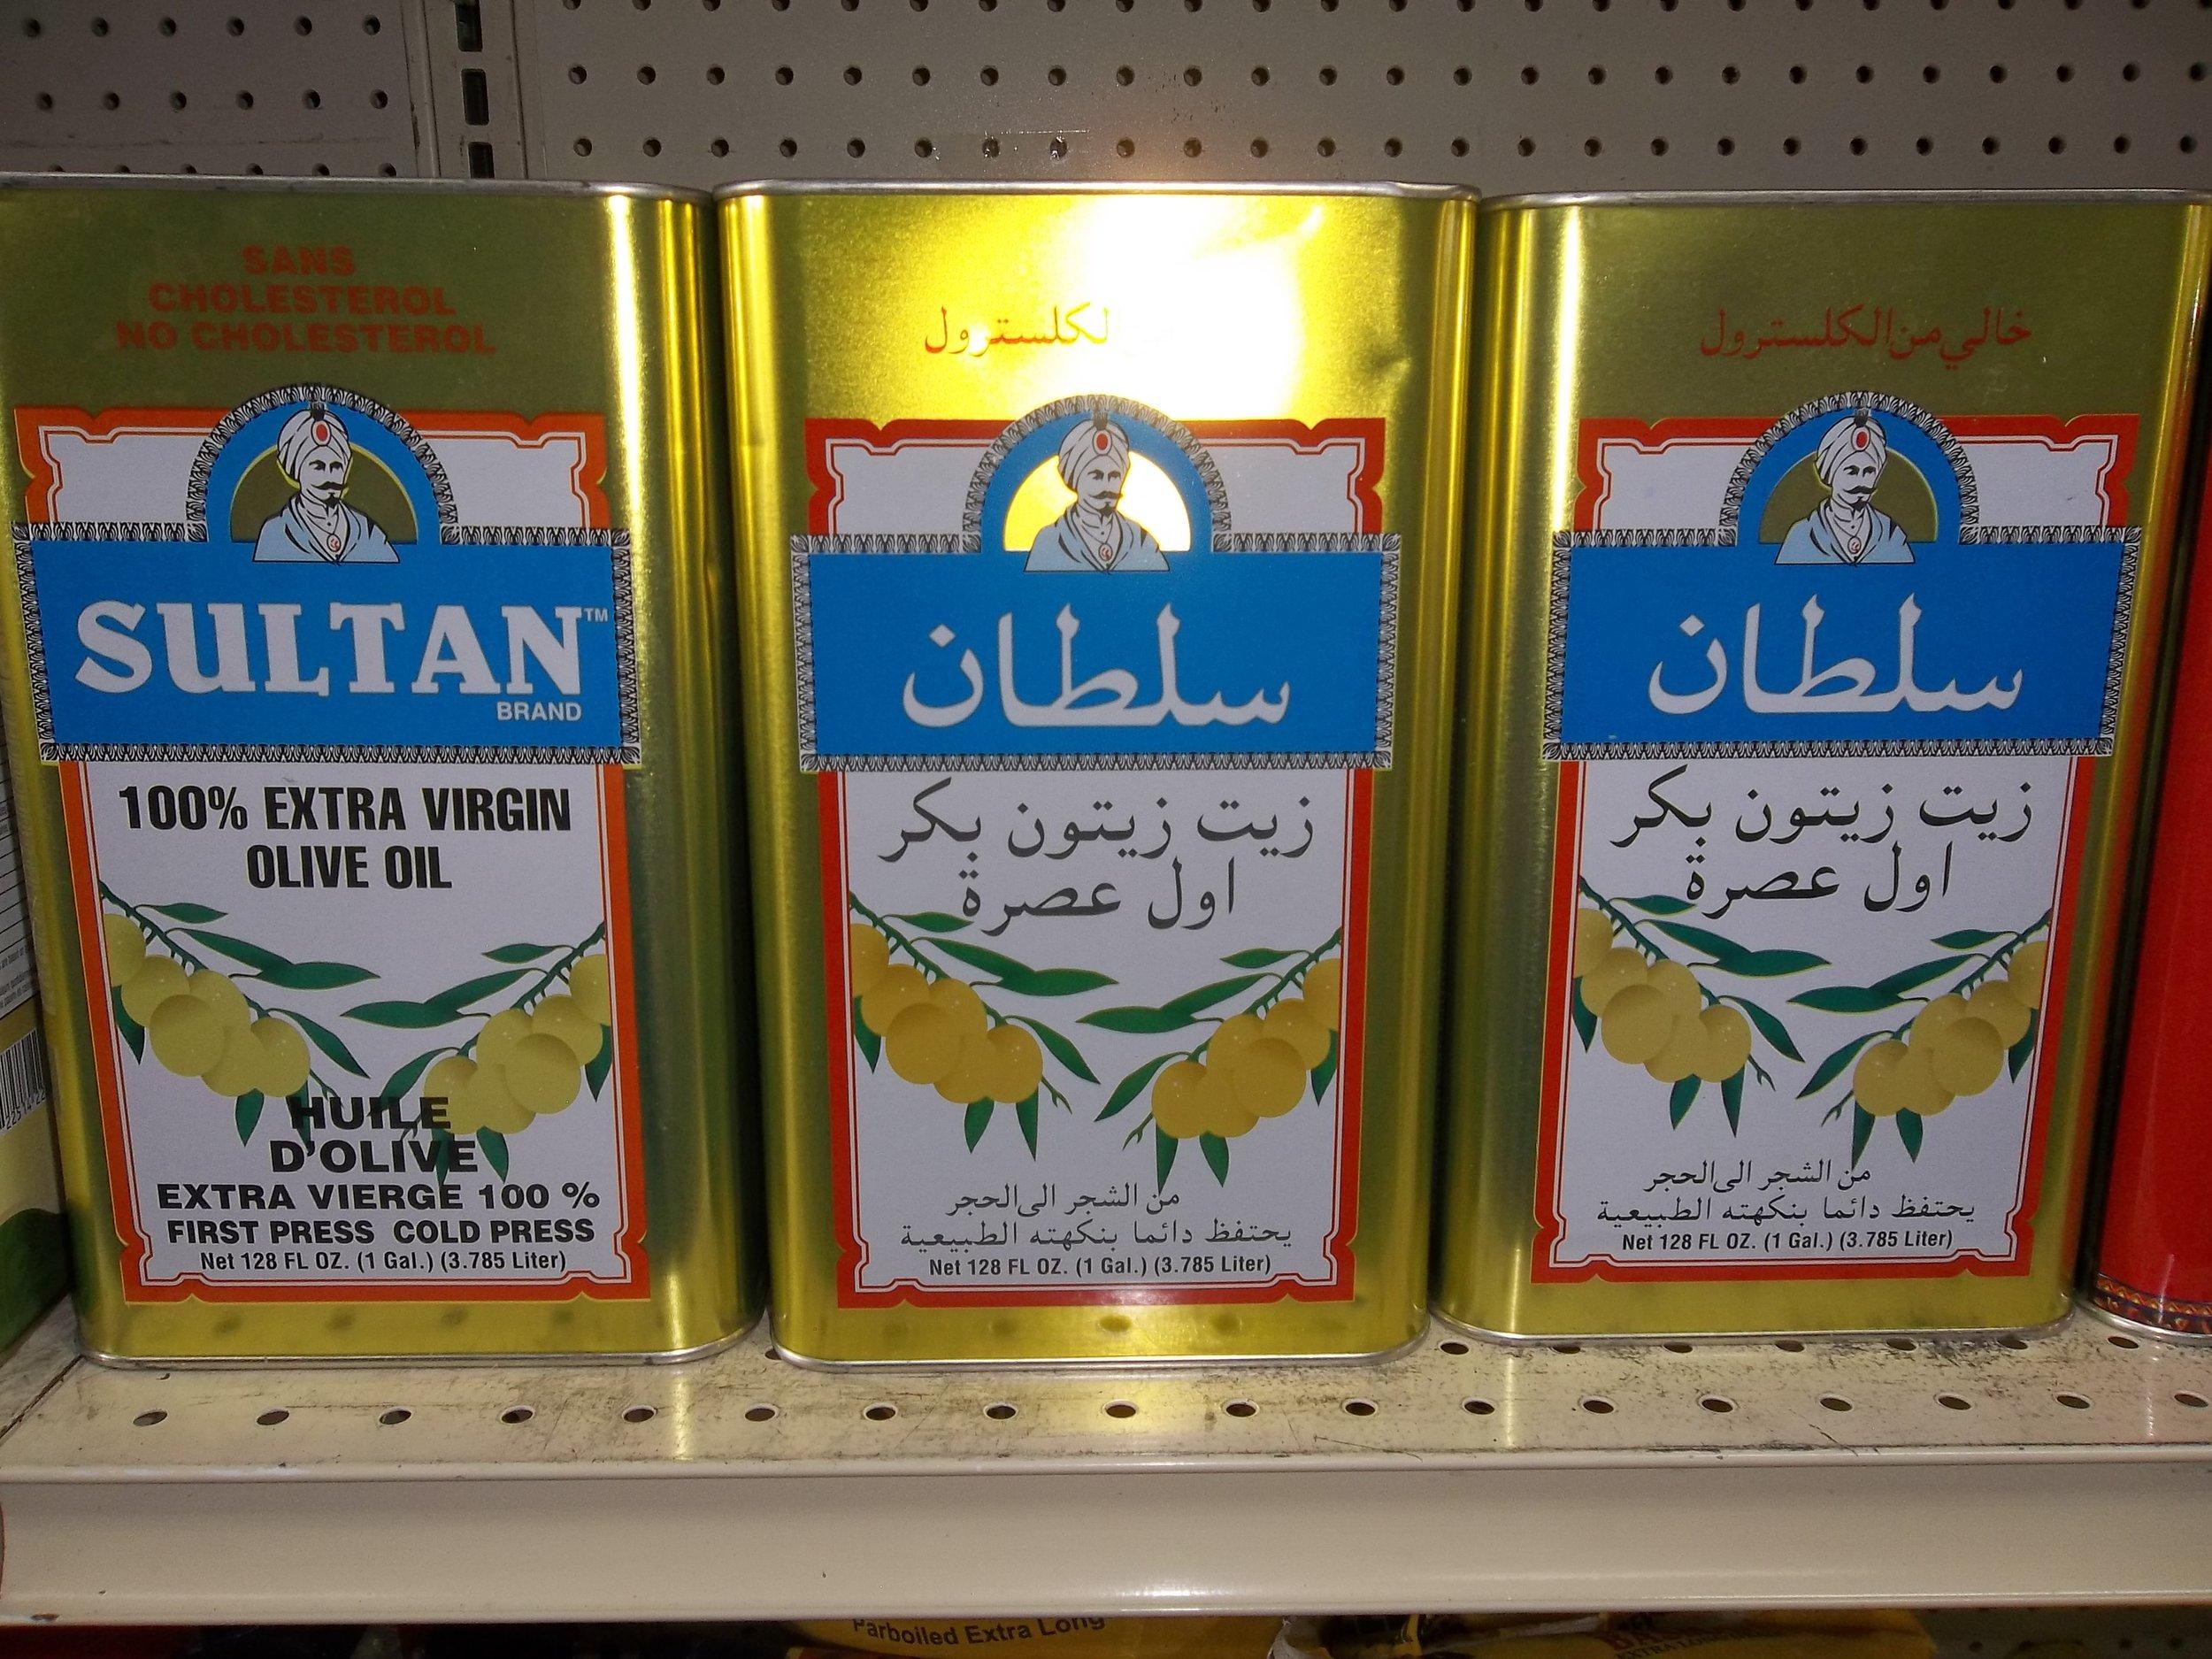 Sultan-Extra-Virgin-Olive-Oil-Pak-Halal-12259-W-87th-St-Parkway-Lenexa-KS-66215.JPG